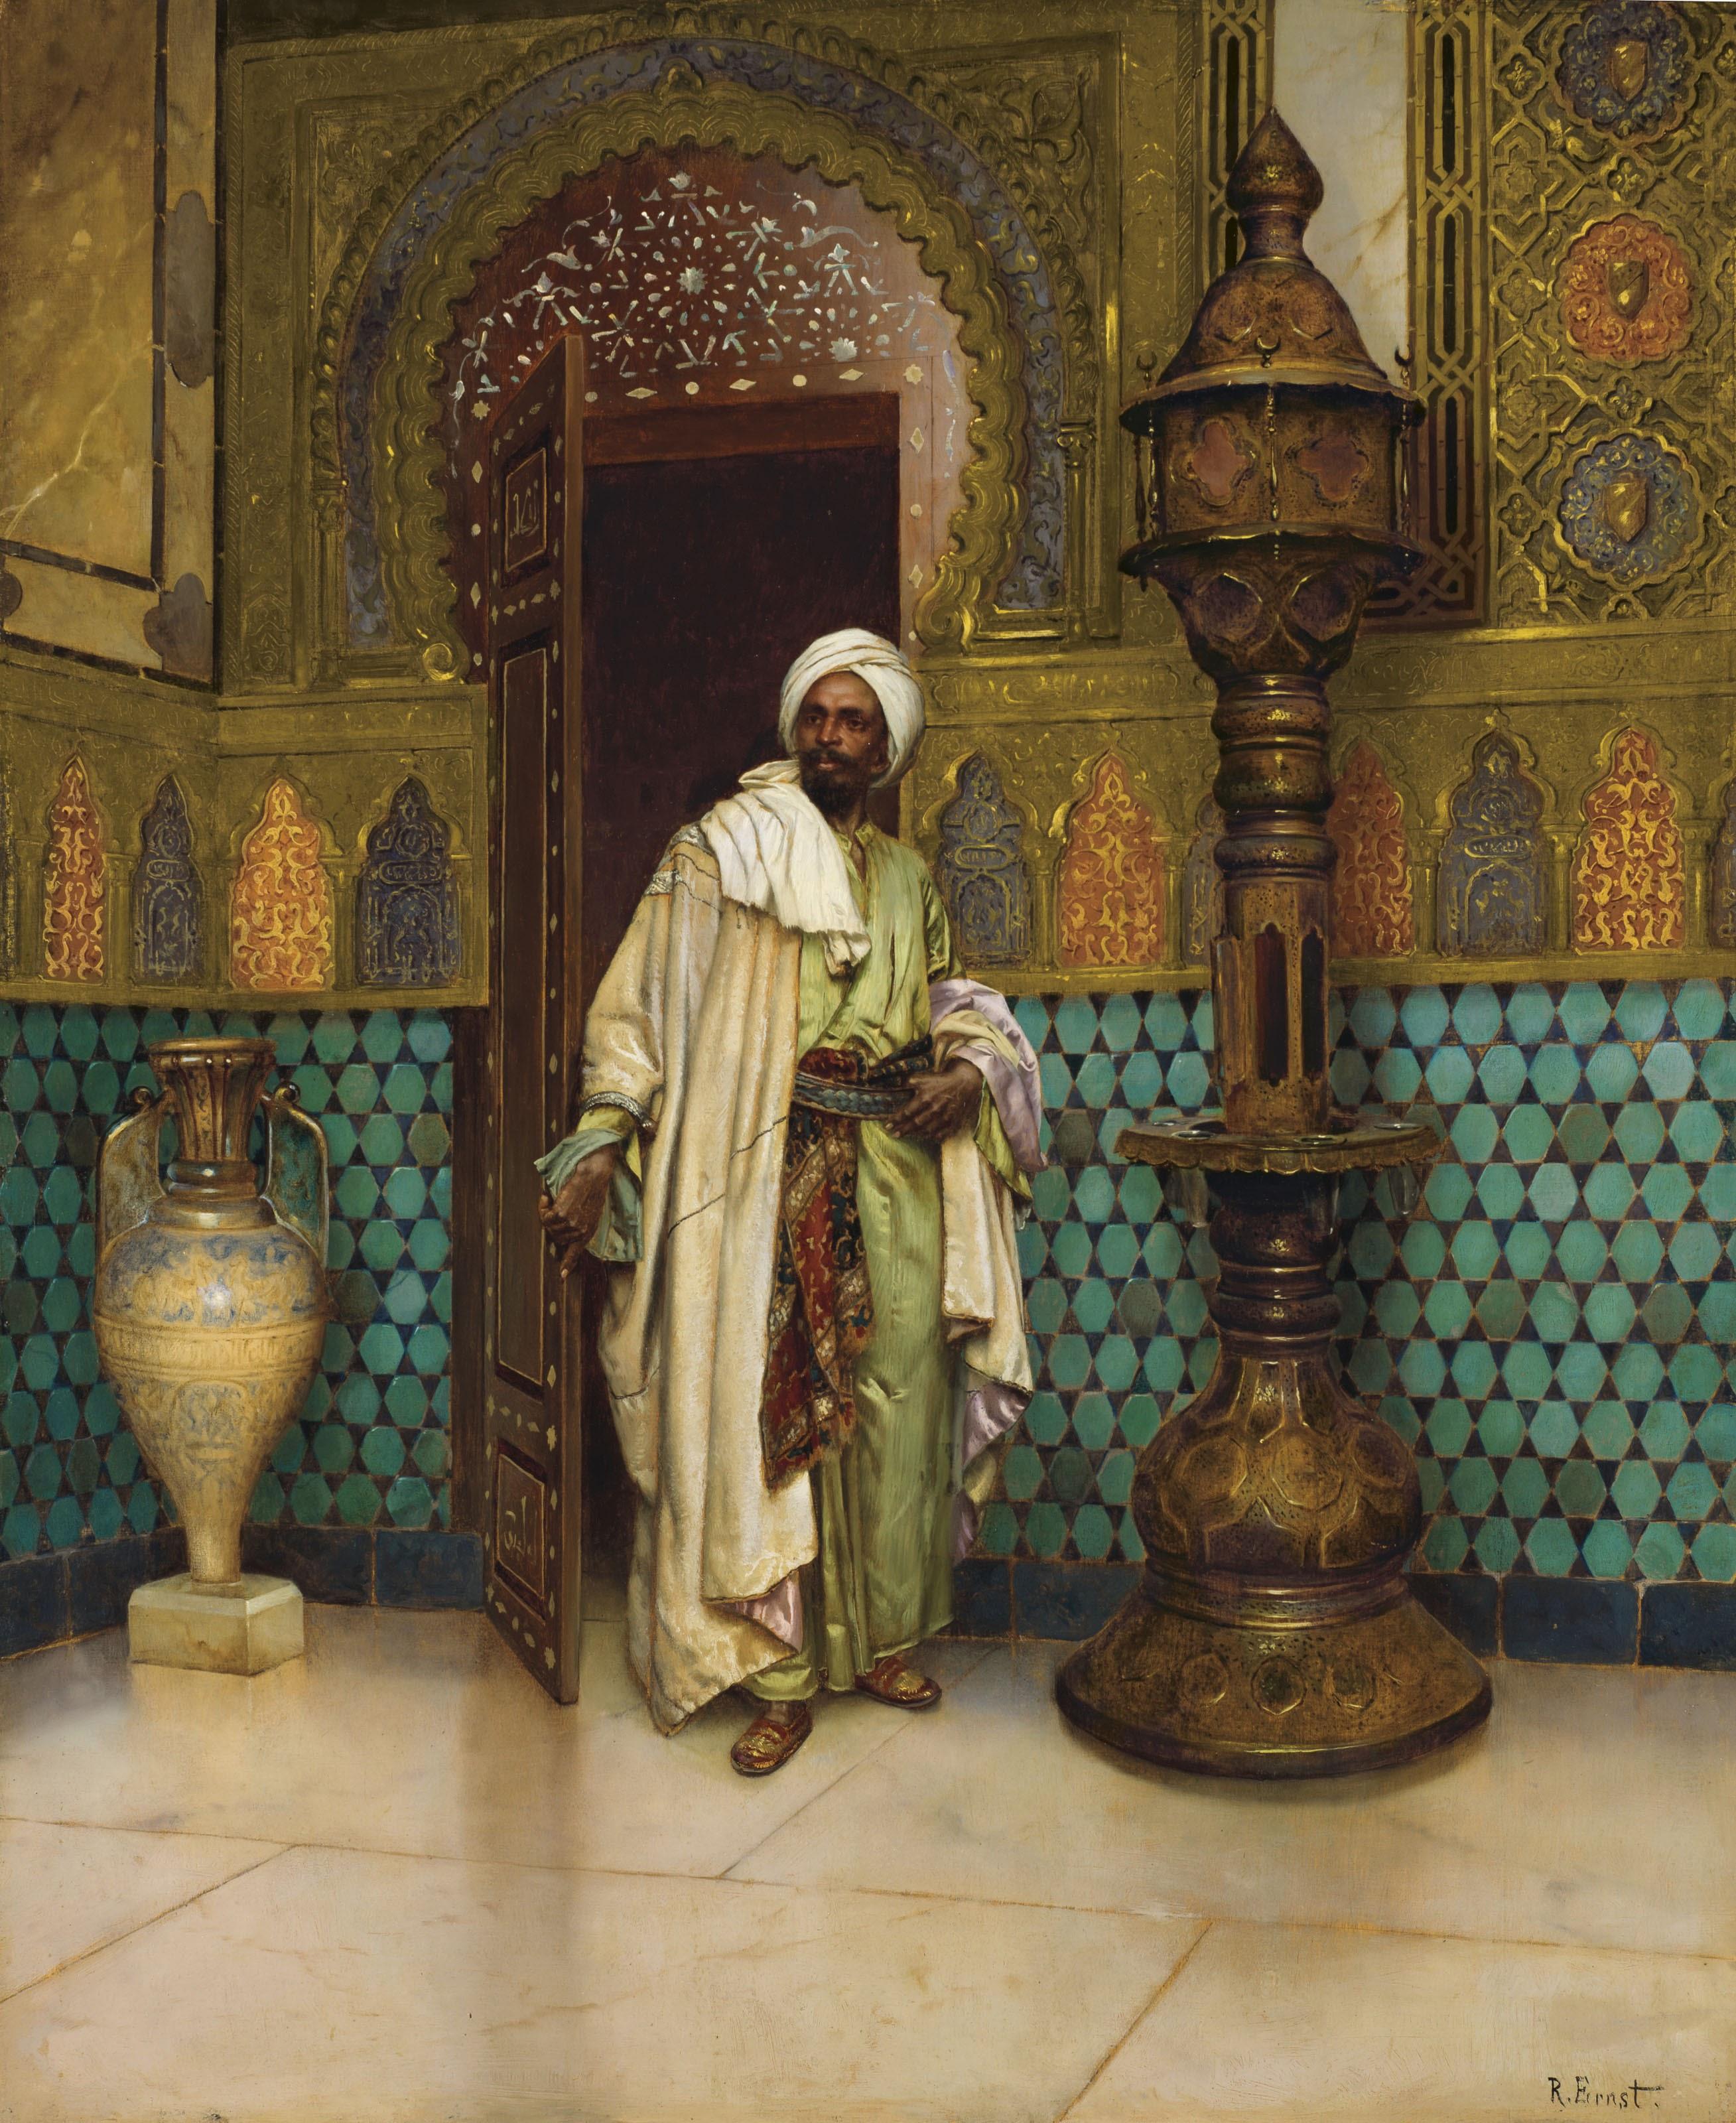 Rudolf Ernst An arab in a palace interior